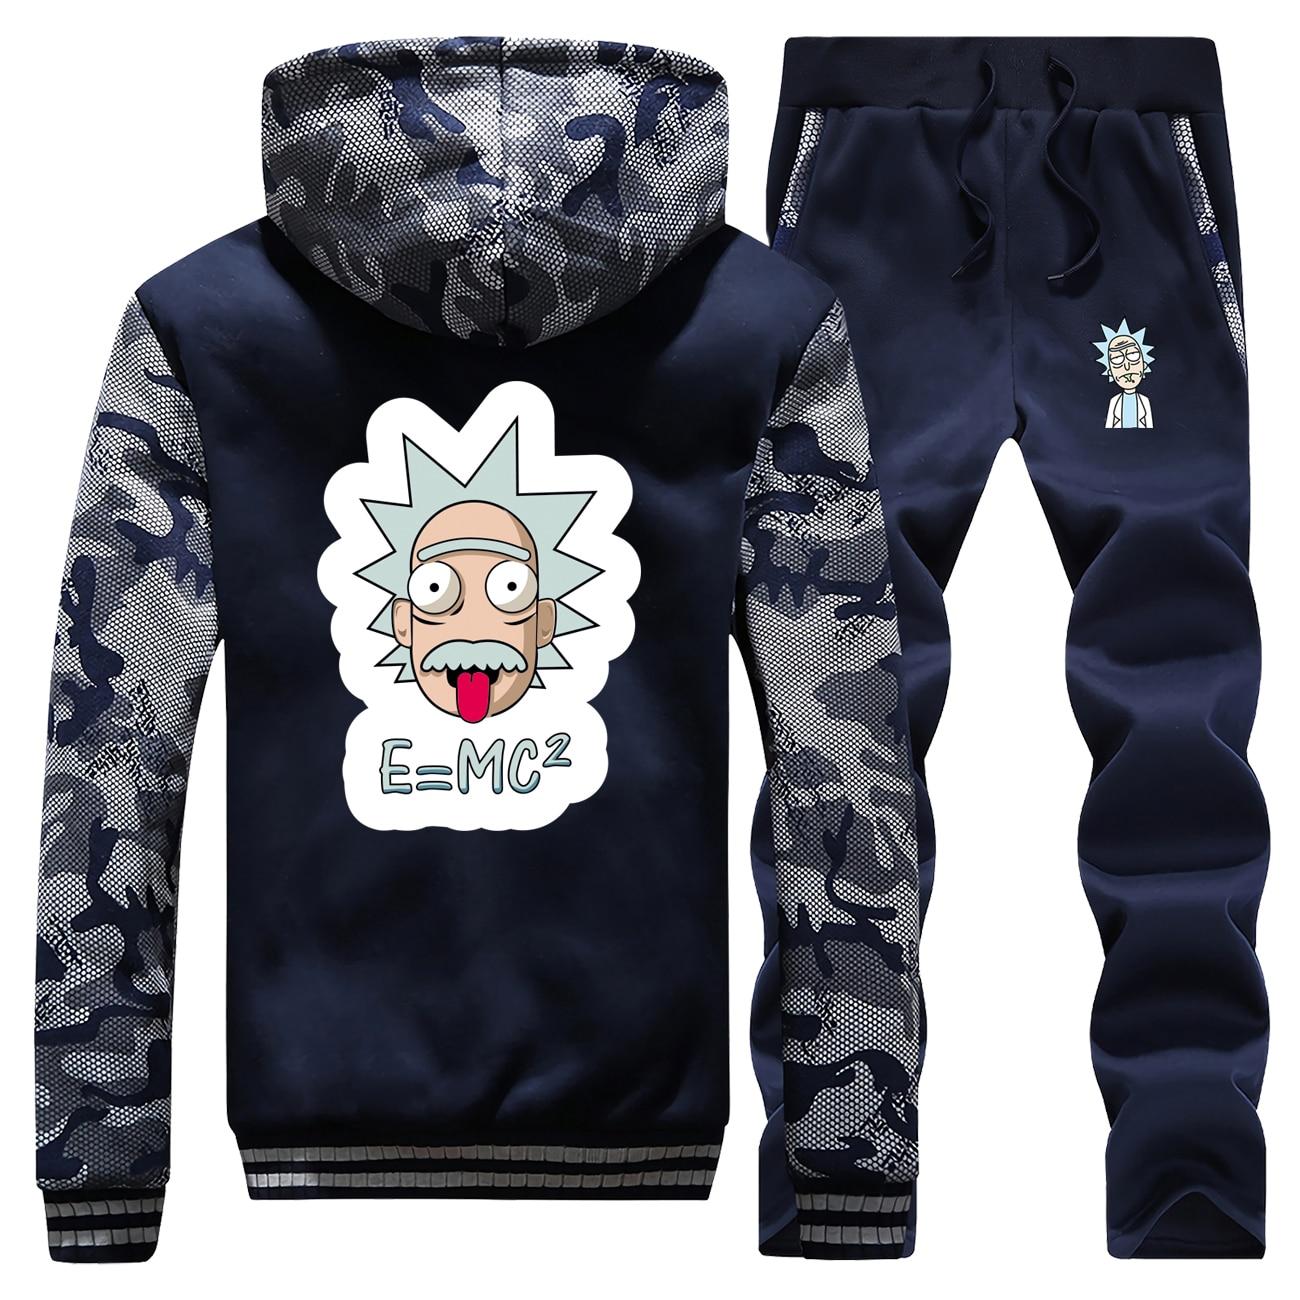 Funny Jackets Set Mens Camo Sets Rick And Morty Winter Casual Fleece Pants Sweatshirt Einstein Cartoon Warm Tracksuit Gym Suit